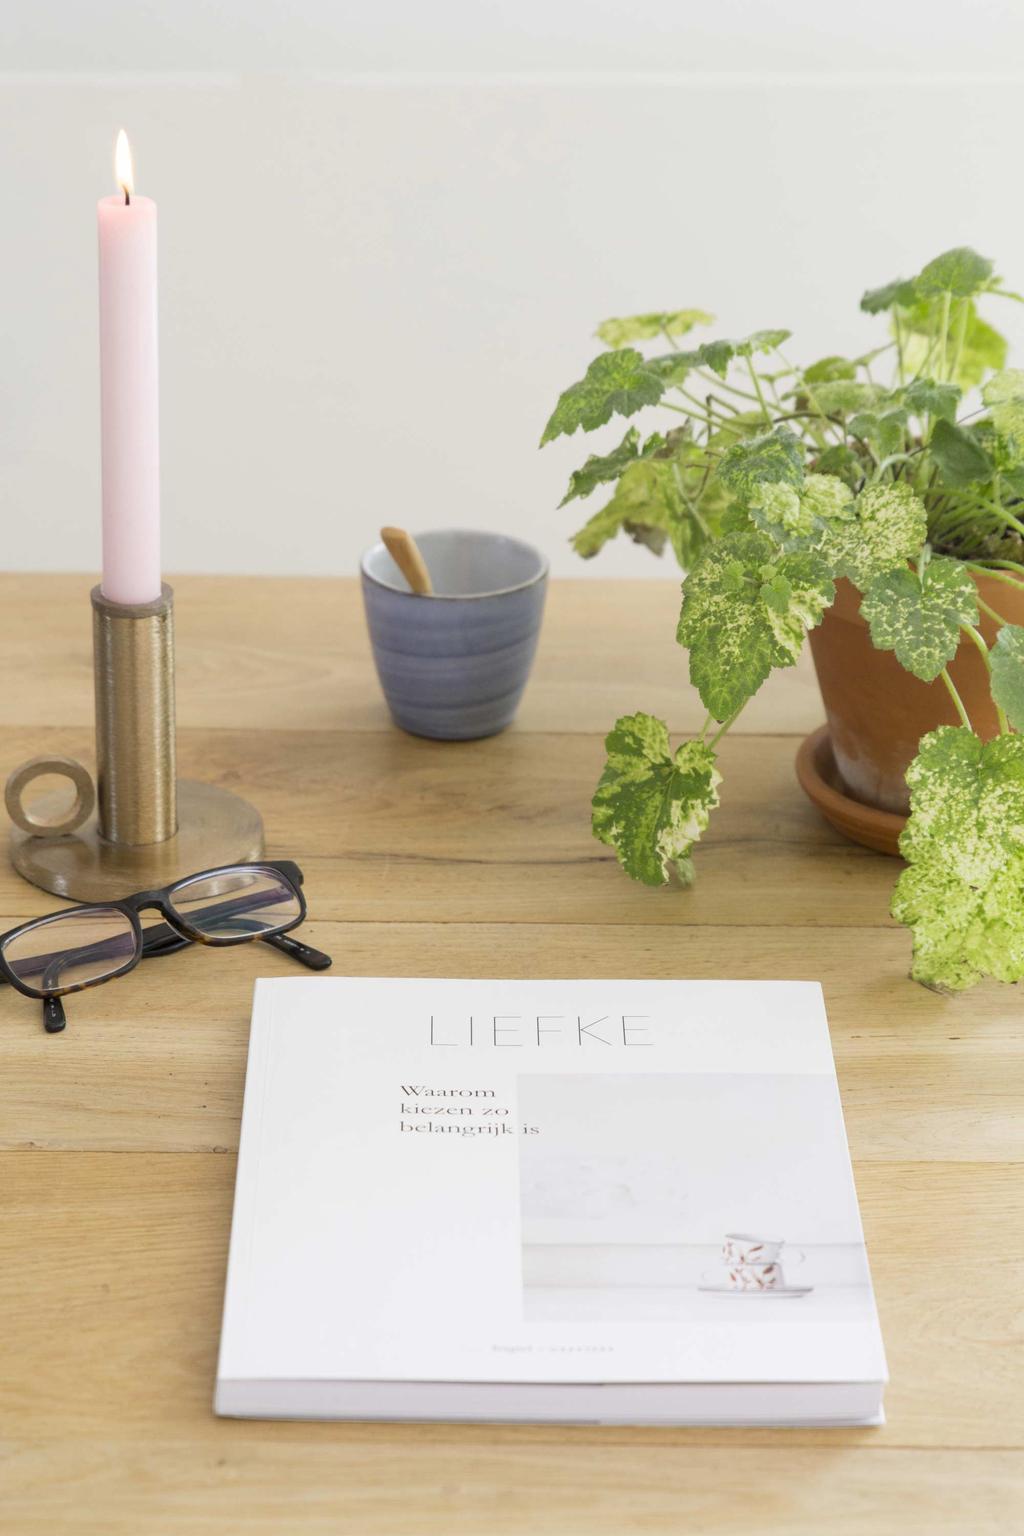 Liefke magazine op tafel met een plant, mok, kaars en bril